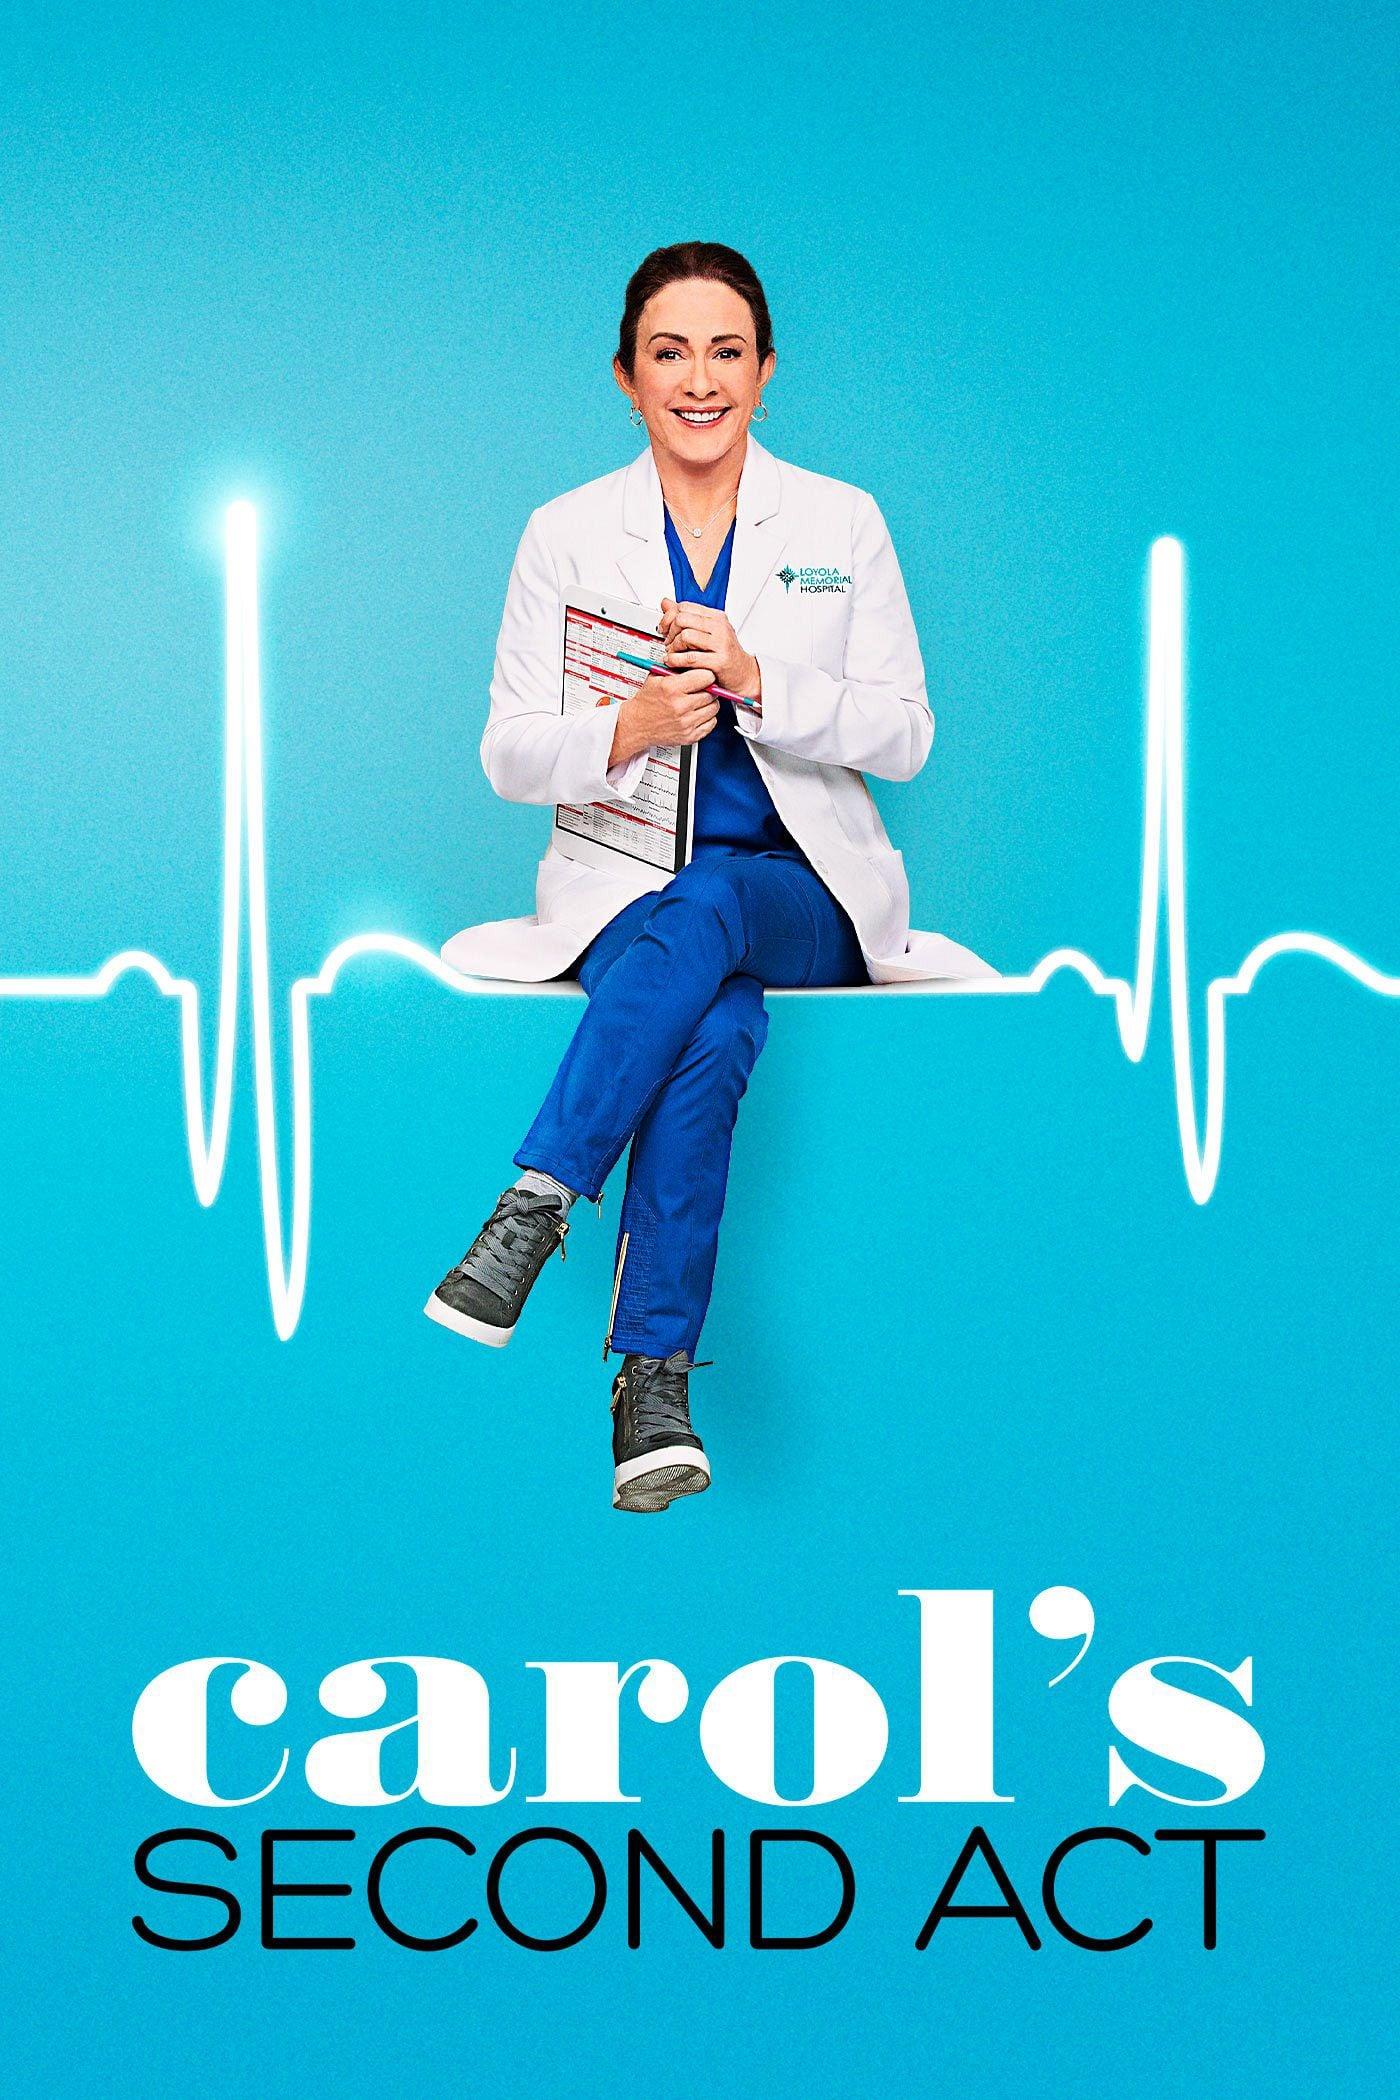 Carol's Second Act